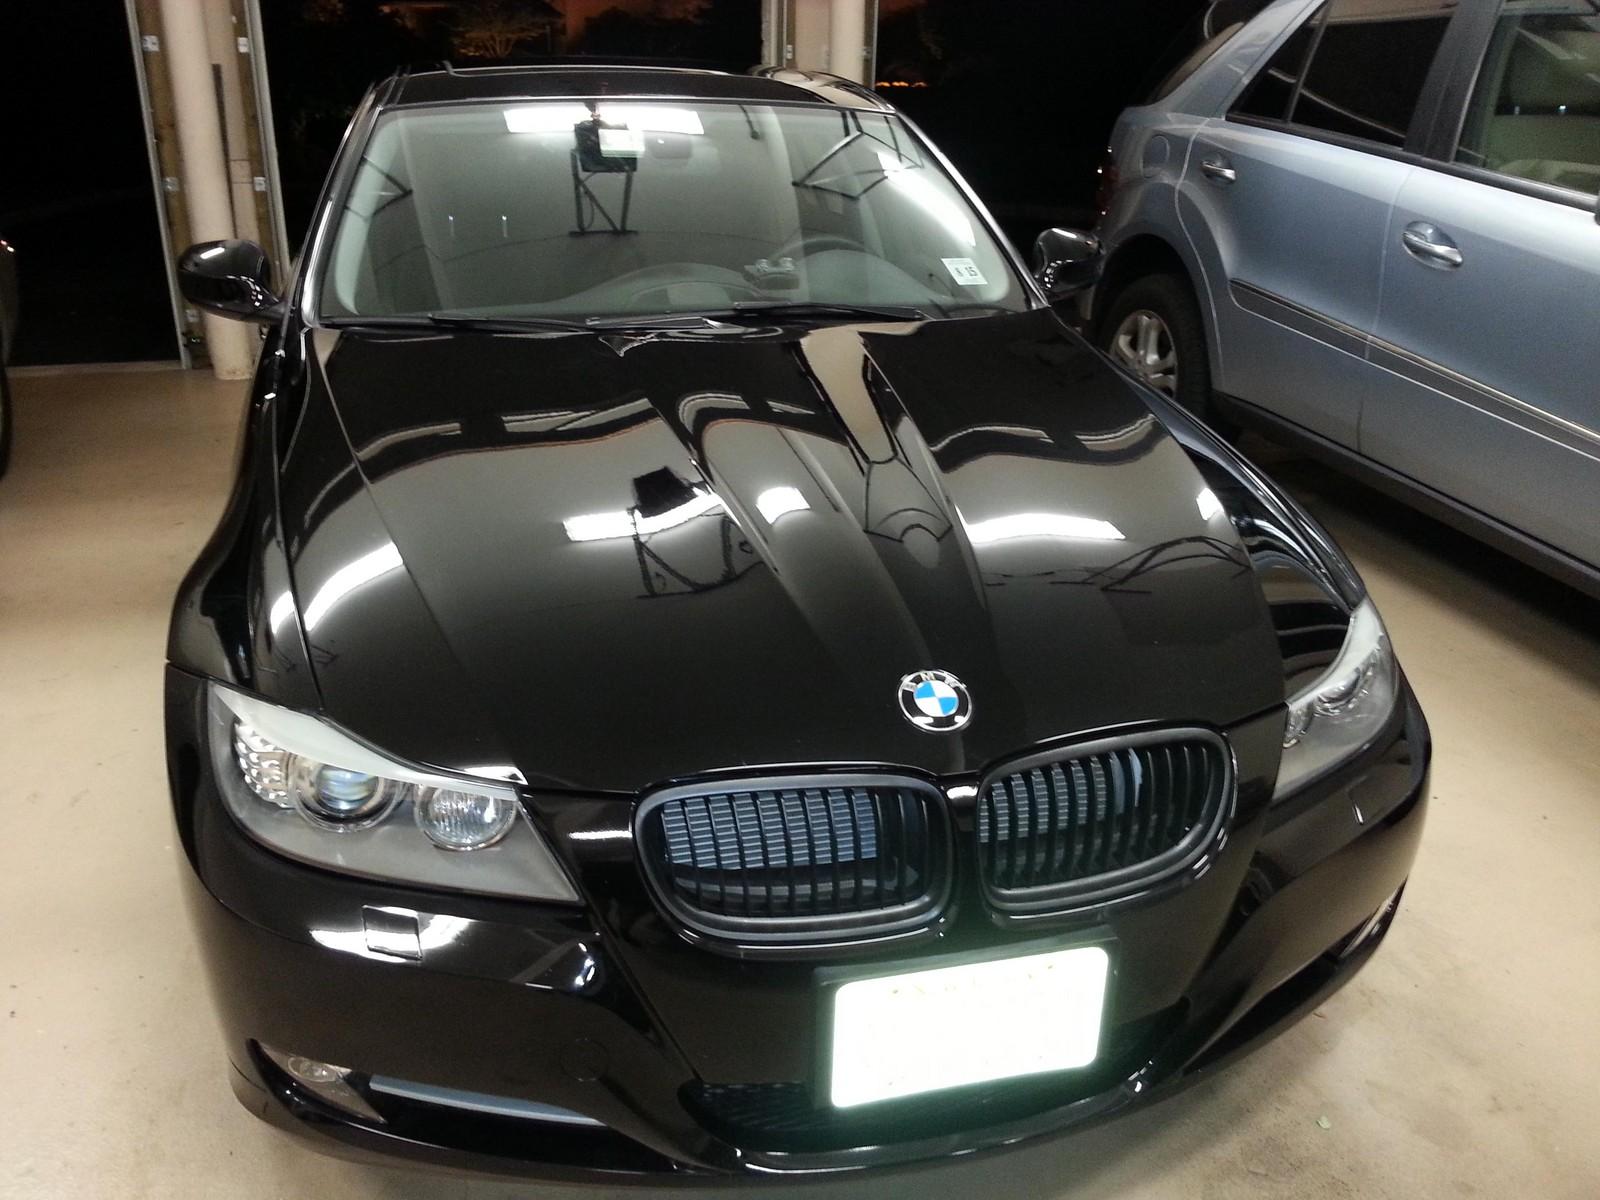 2011 Black BMW 335xi 335i XDrive Mods Upgrades Wallpaper